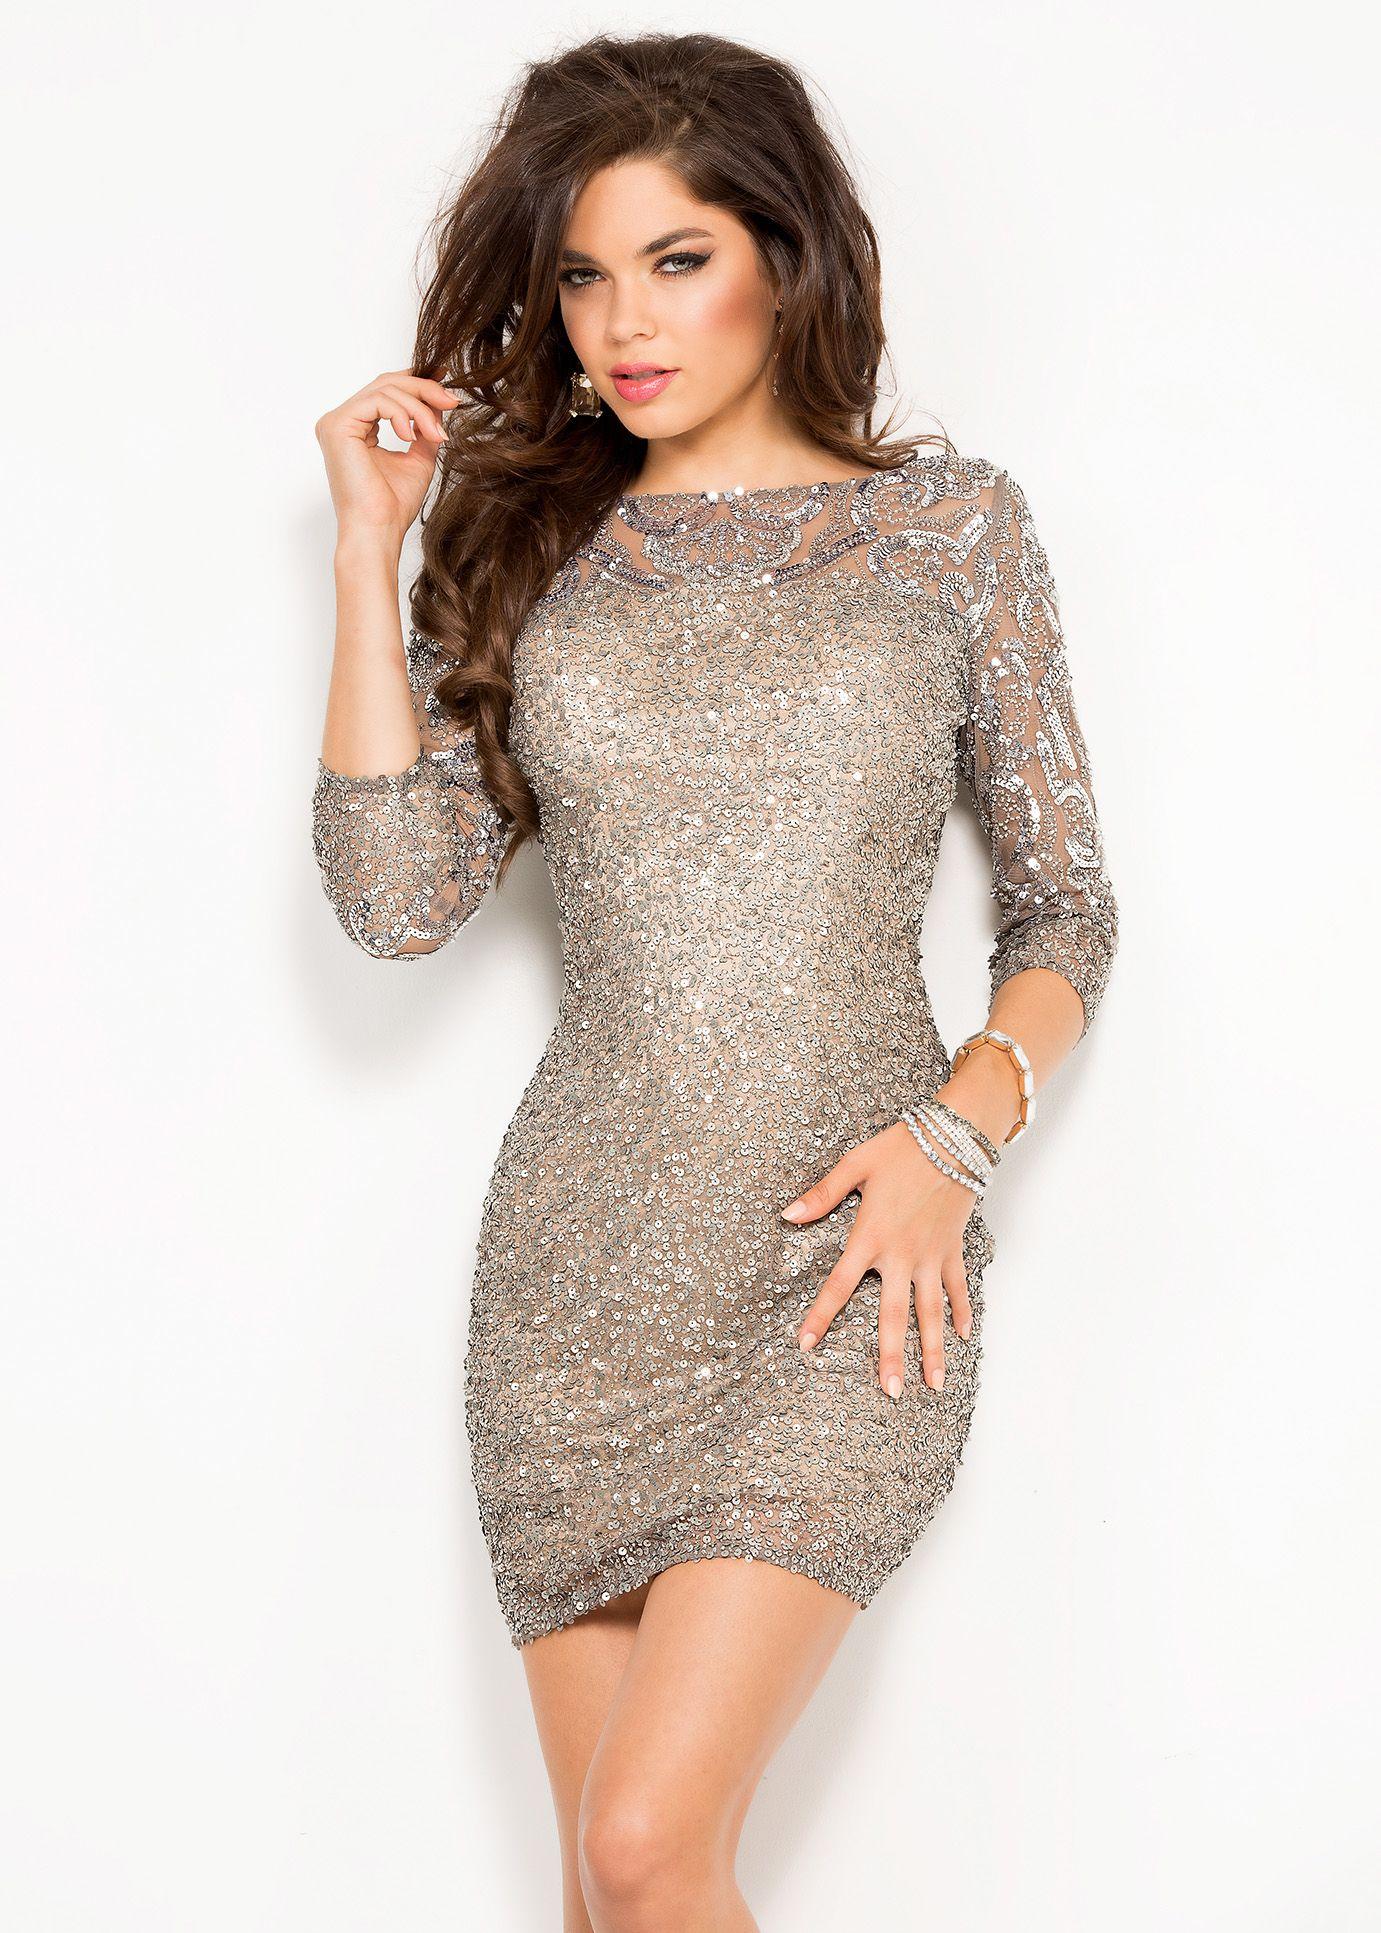 cd30ad059a0 Scala 48524 Sparkling Beaded Illusion Short Dress